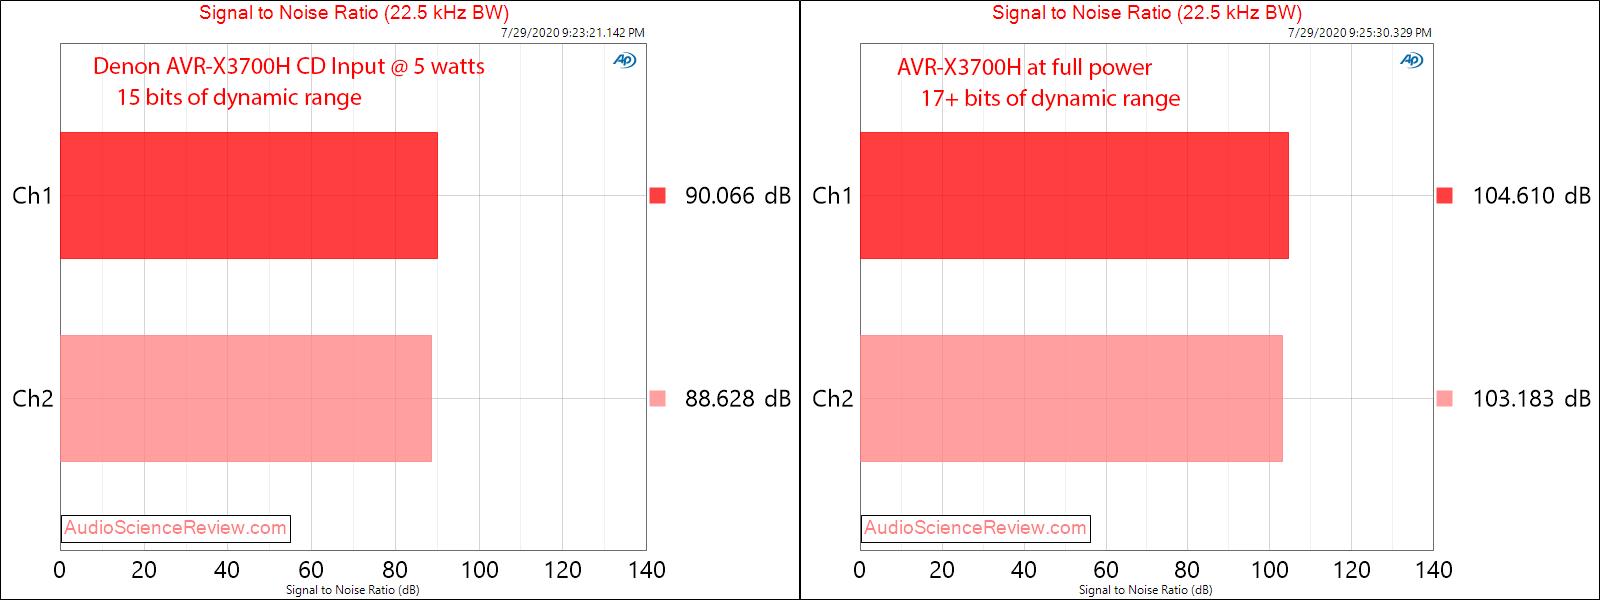 Denon AVR-X3700H 9.2 channel 8K AV Receiver Dolby Atmos CD Input SNR Audio Measurements.png